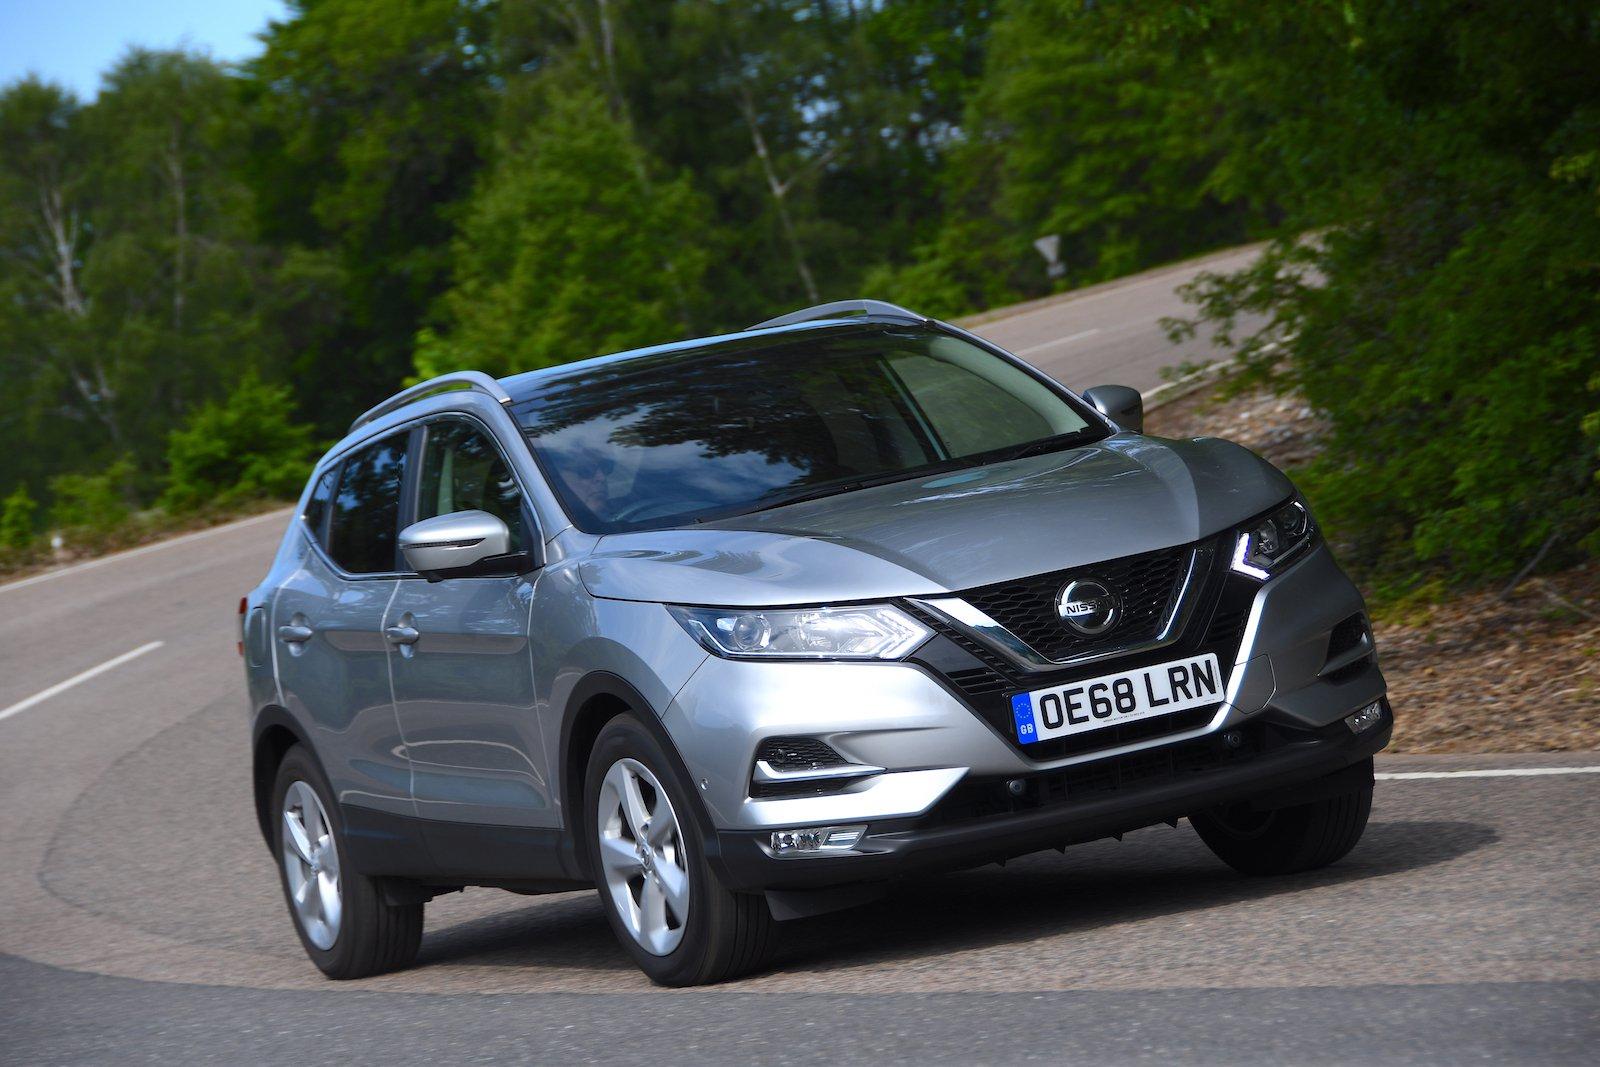 Used Nissan Qashqai long-term test review